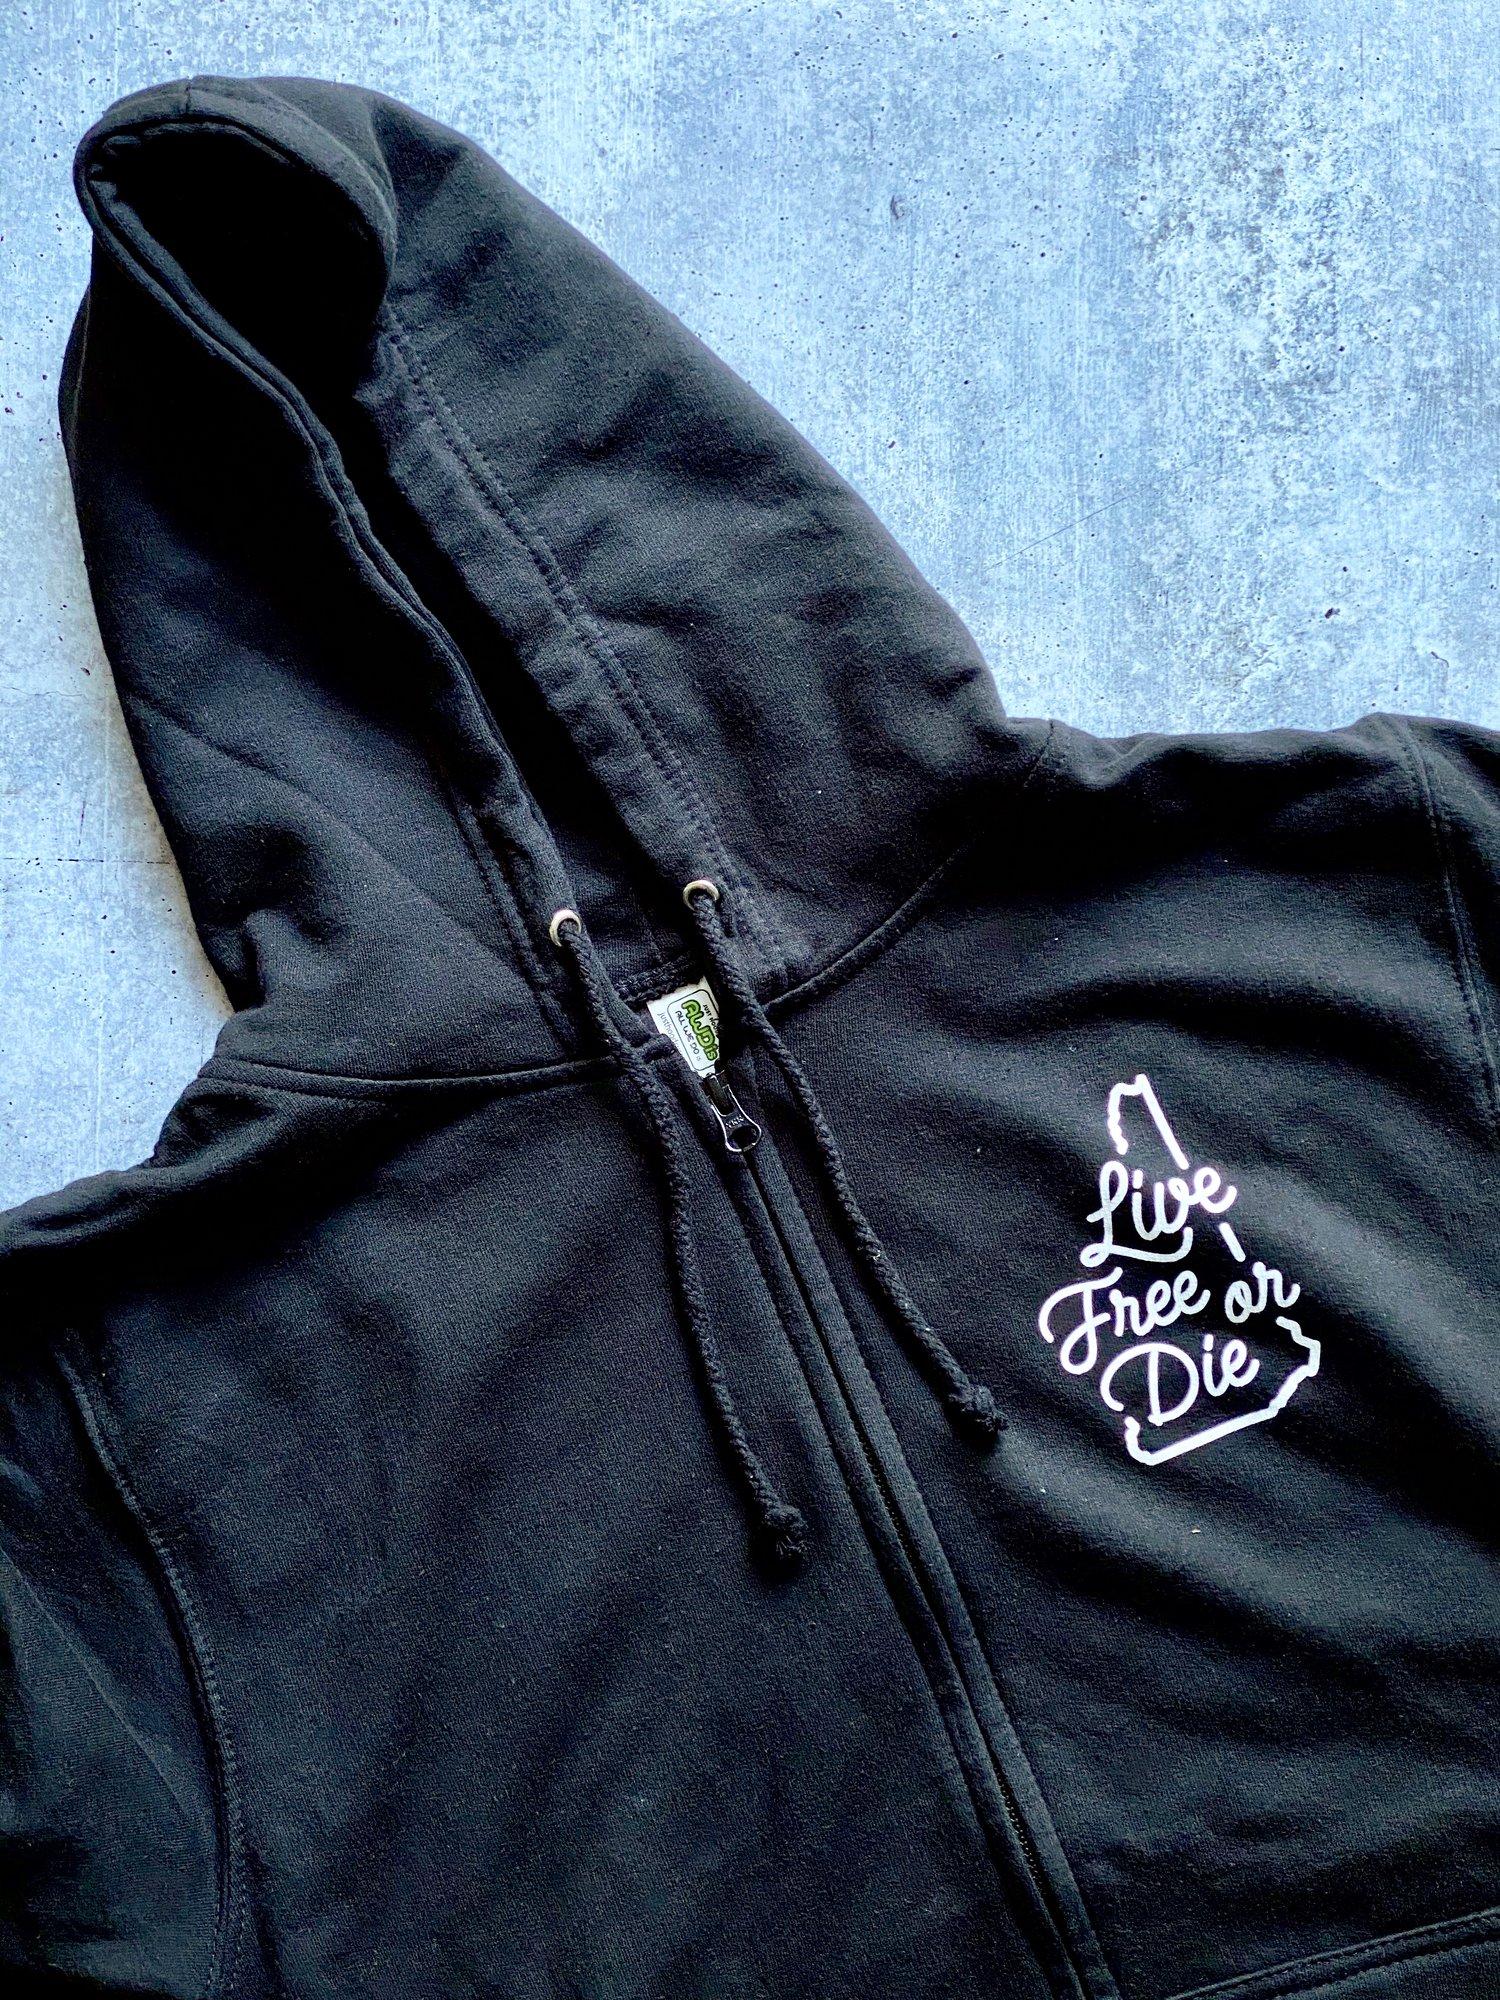 Image of Cursive LFOD zip up hoodie with pockets -black